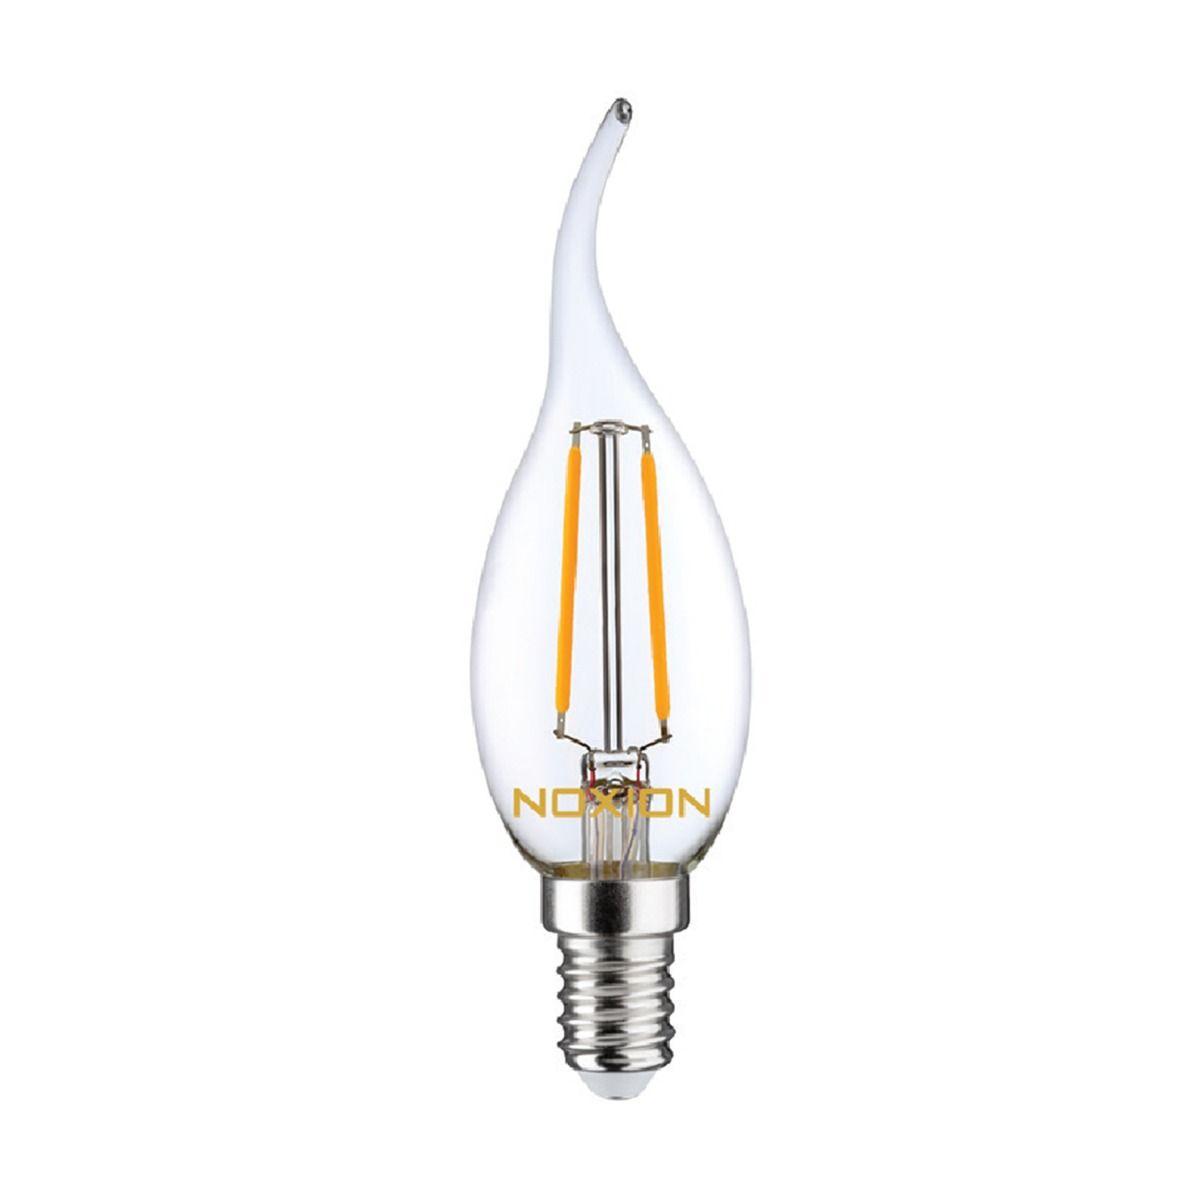 Noxion Lucent Filament LED Candle 2.5W 827 BA35 E14 Klar | Extra Varm Vit - Ersättare 25W